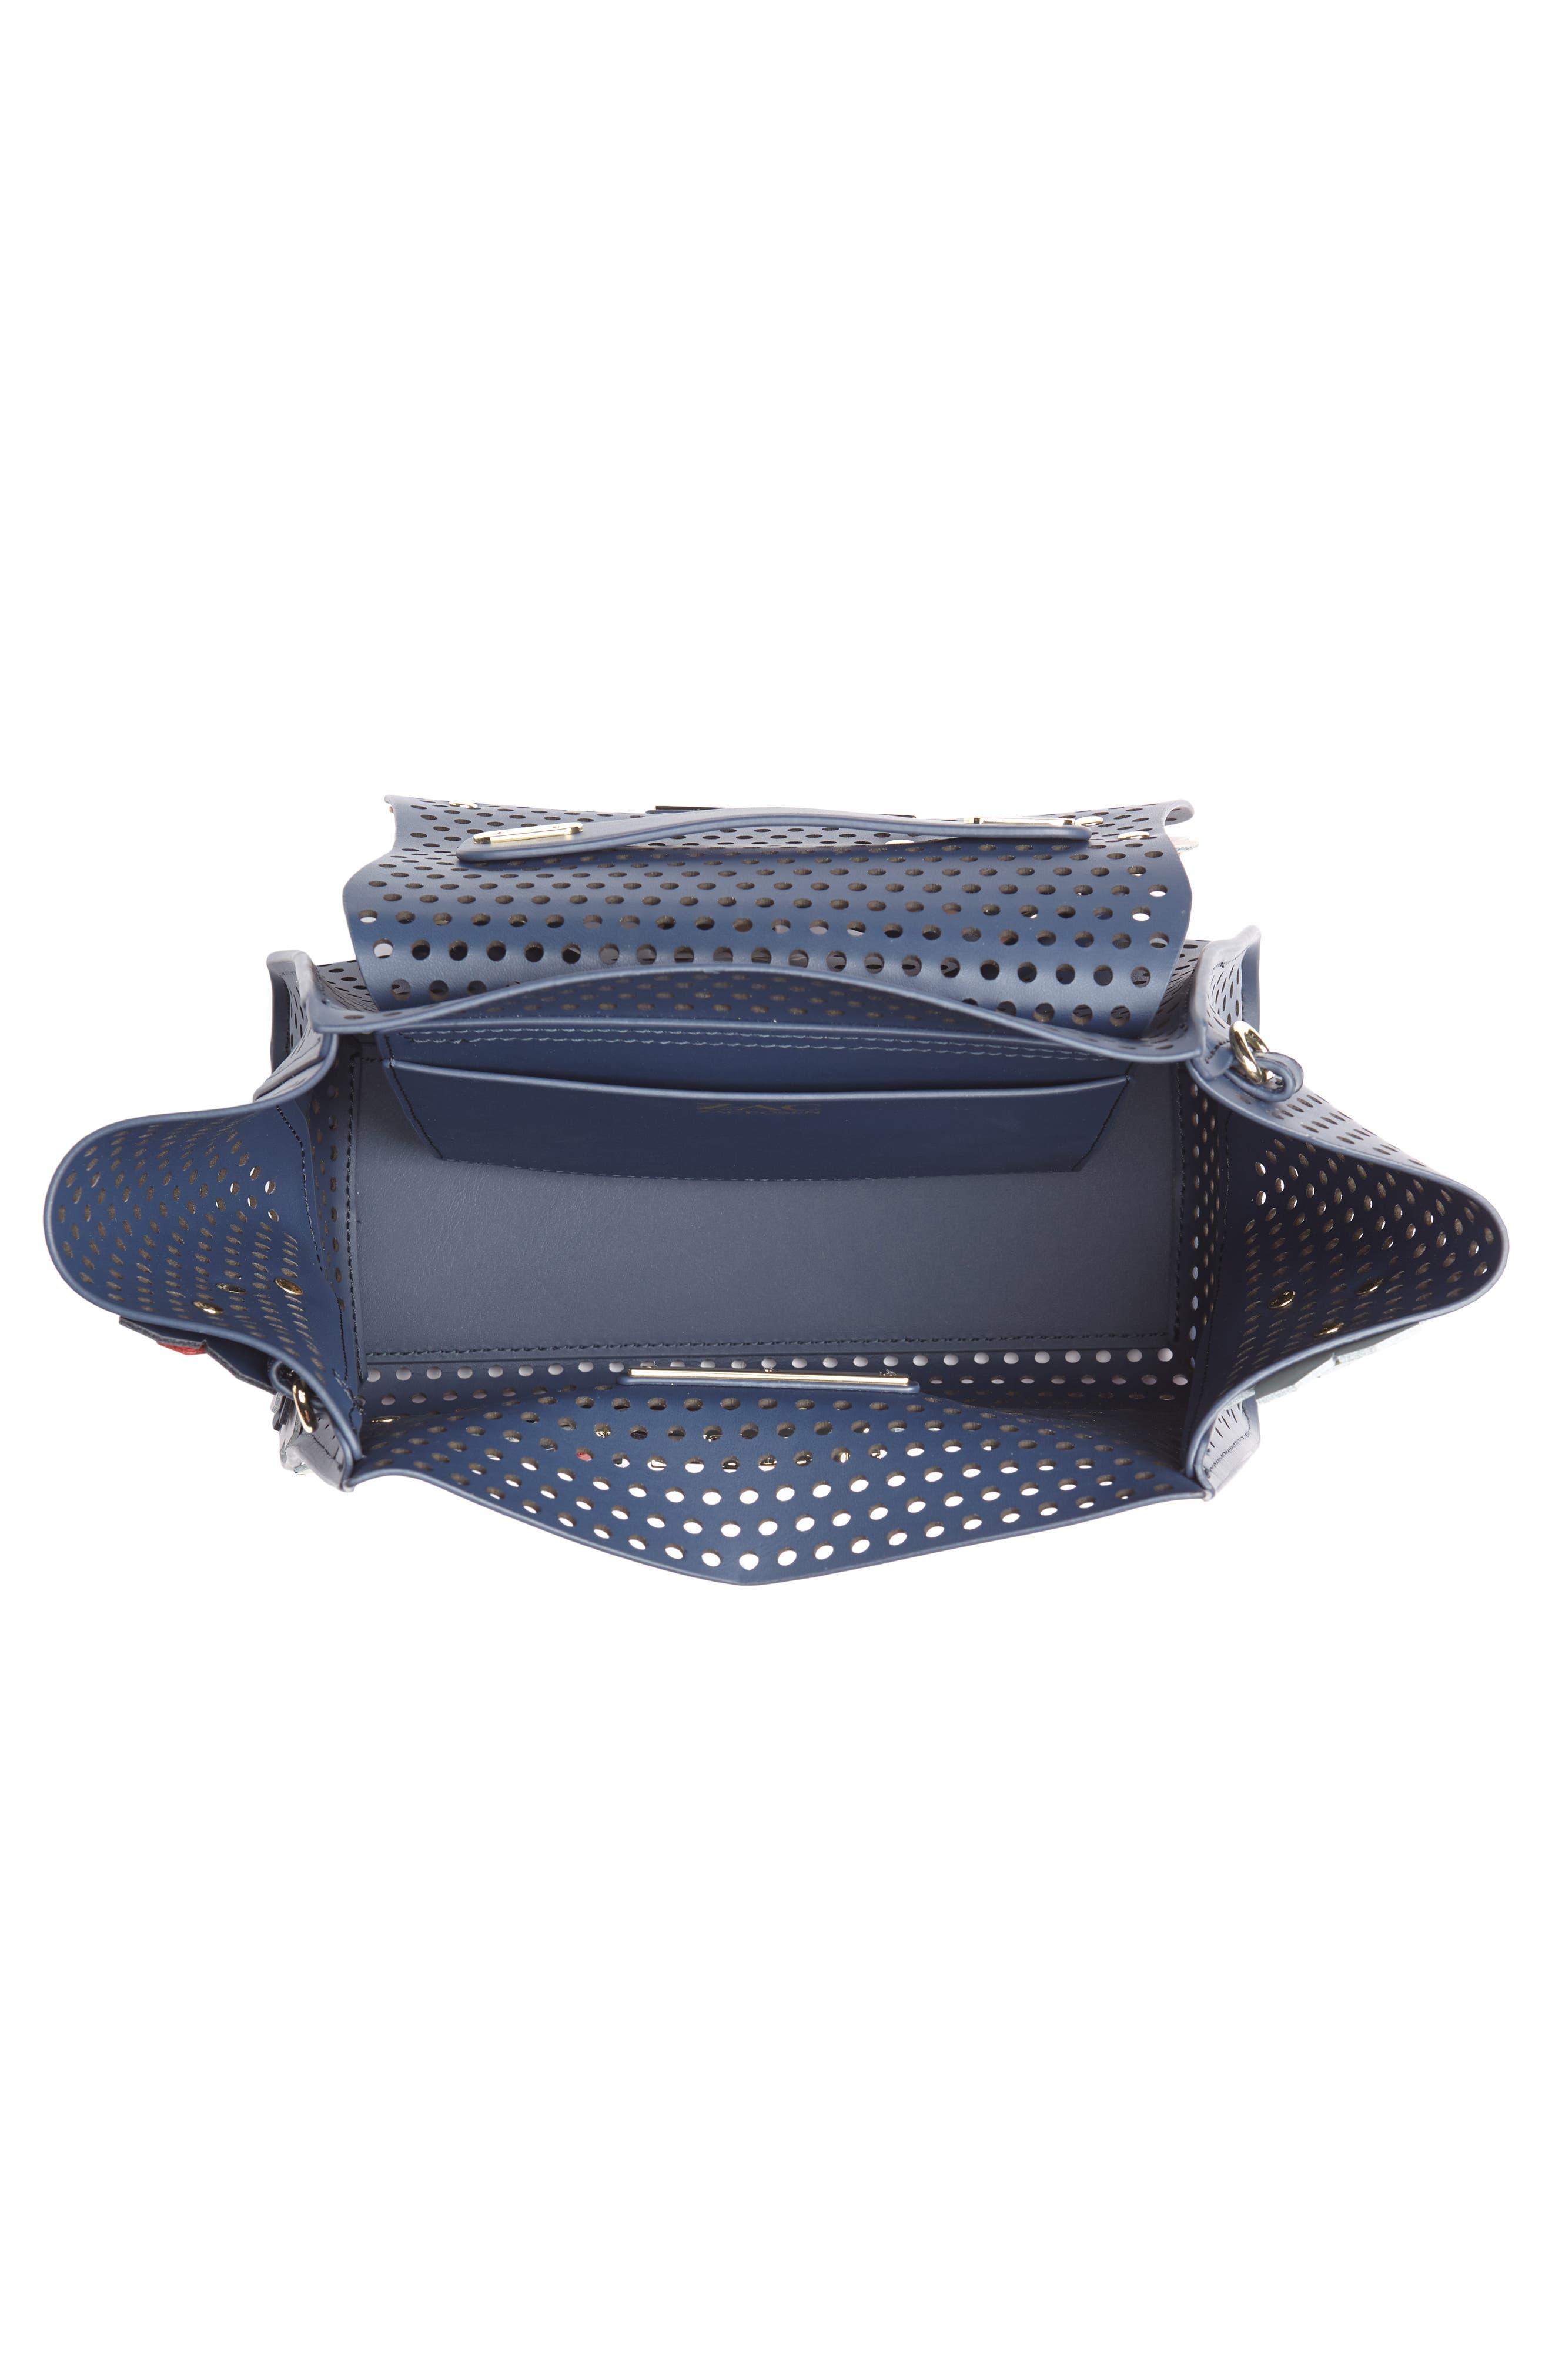 Eartha Kit Convertible Calfskin Leather Backpack,                             Alternate thumbnail 5, color,                             Blue/ Rainbow